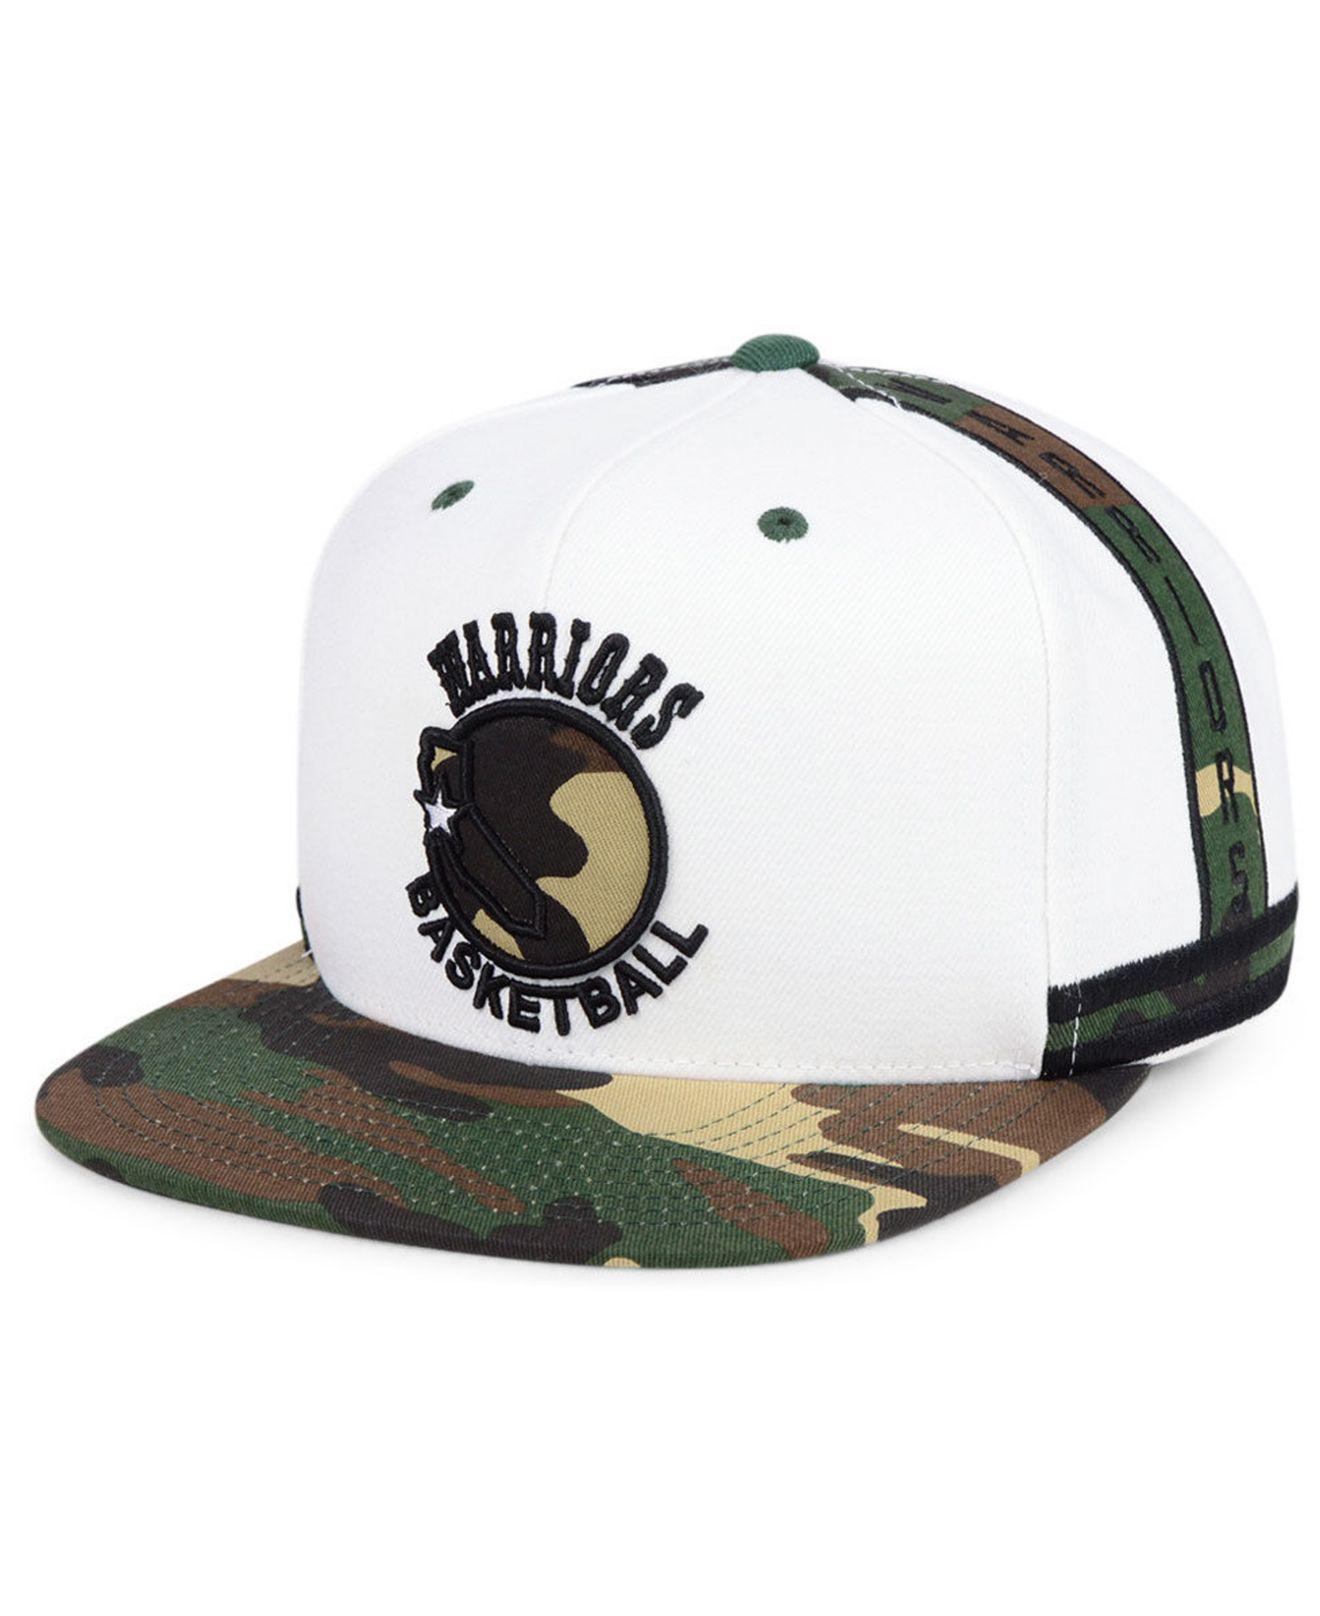 7a13d272935 Mitchell   Ness. Men s White Golden State Warriors Straight Fire Camo Hook  Snapback Cap